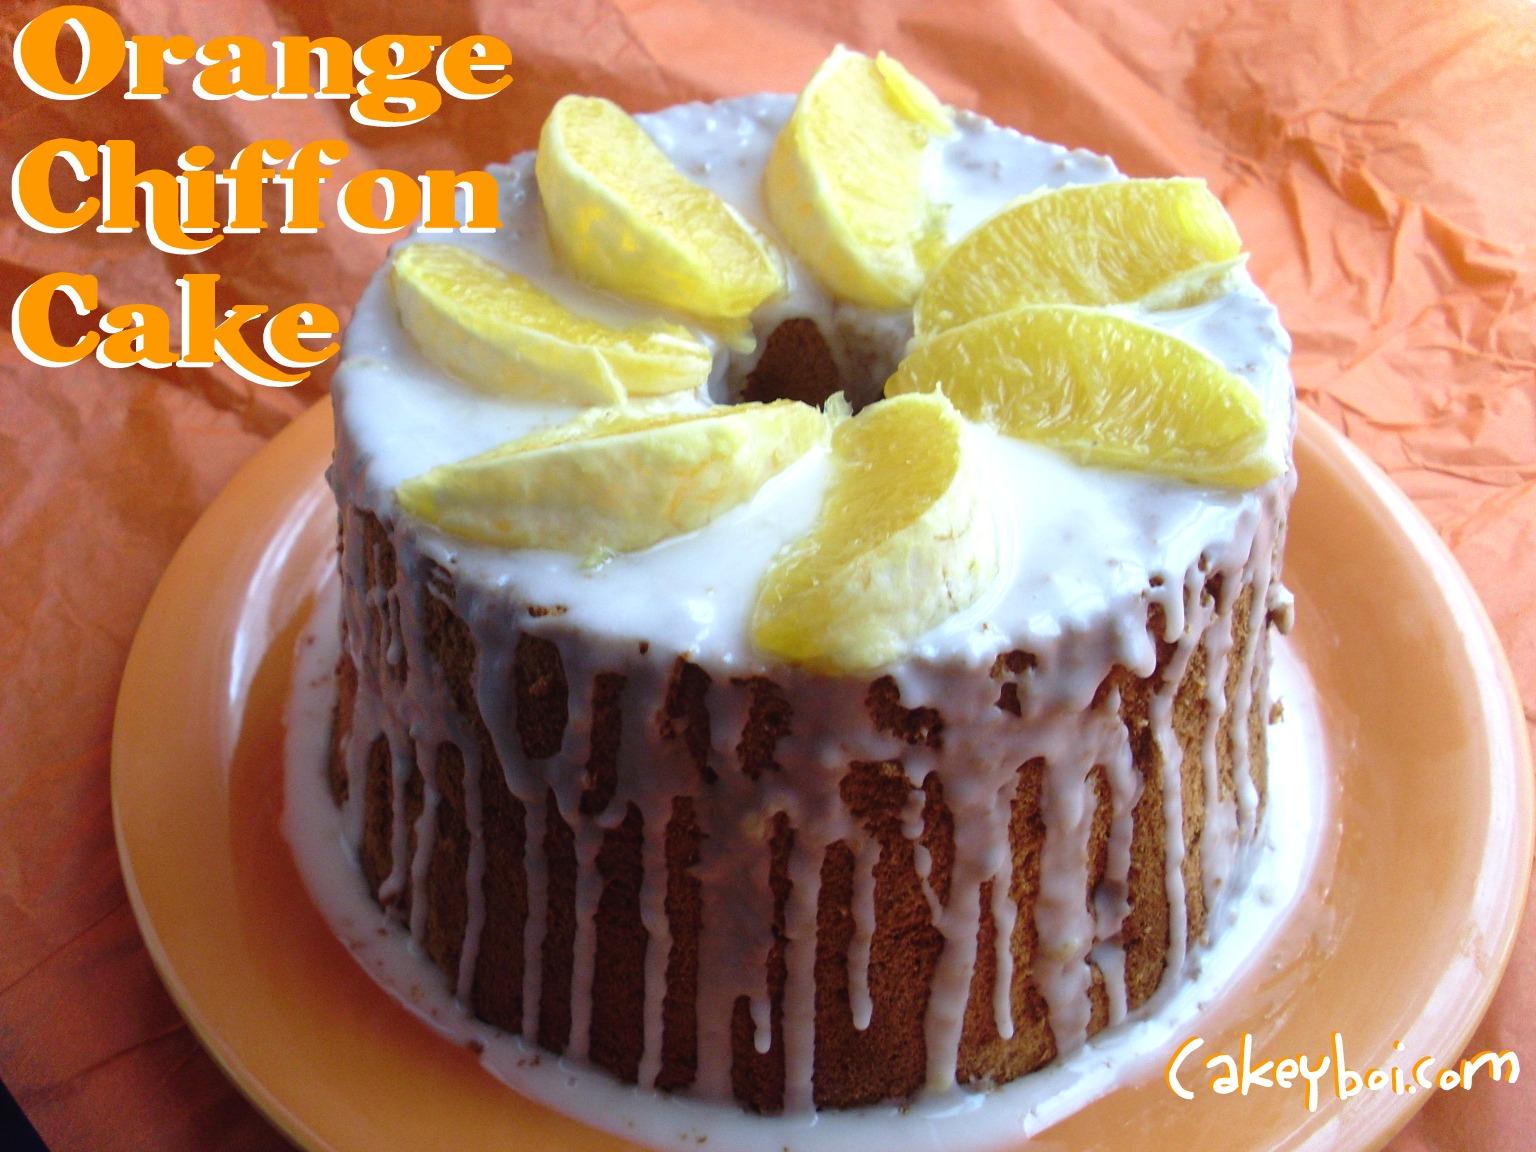 Orange Chiffon Cake with Buttermilk Ice Cream forecast